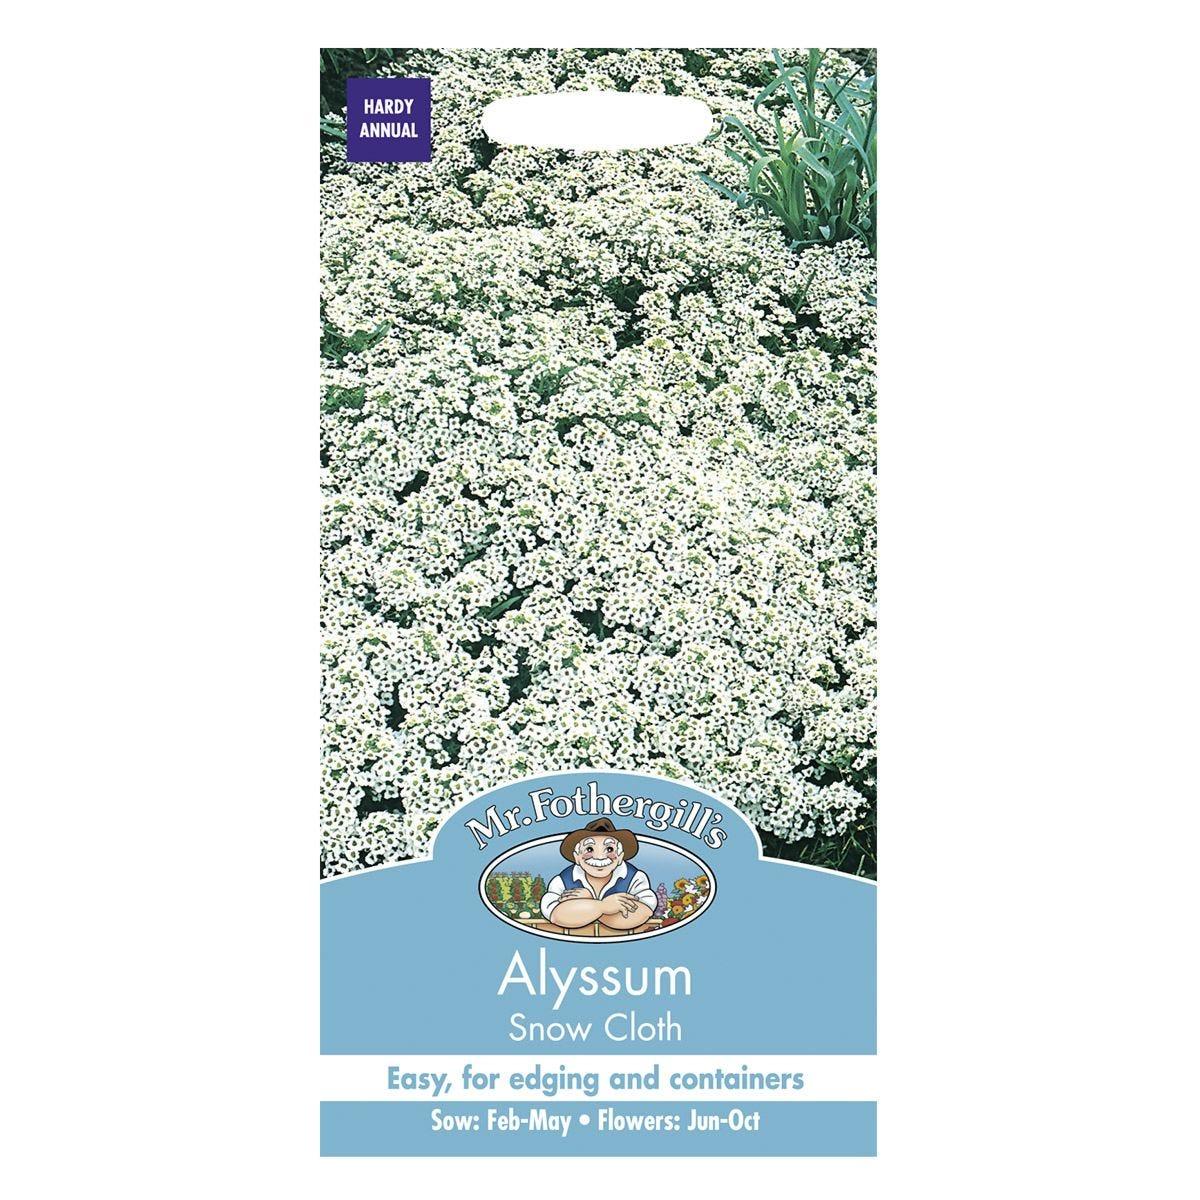 Mr Fothergill's Alyssum Snow Cloth Seeds